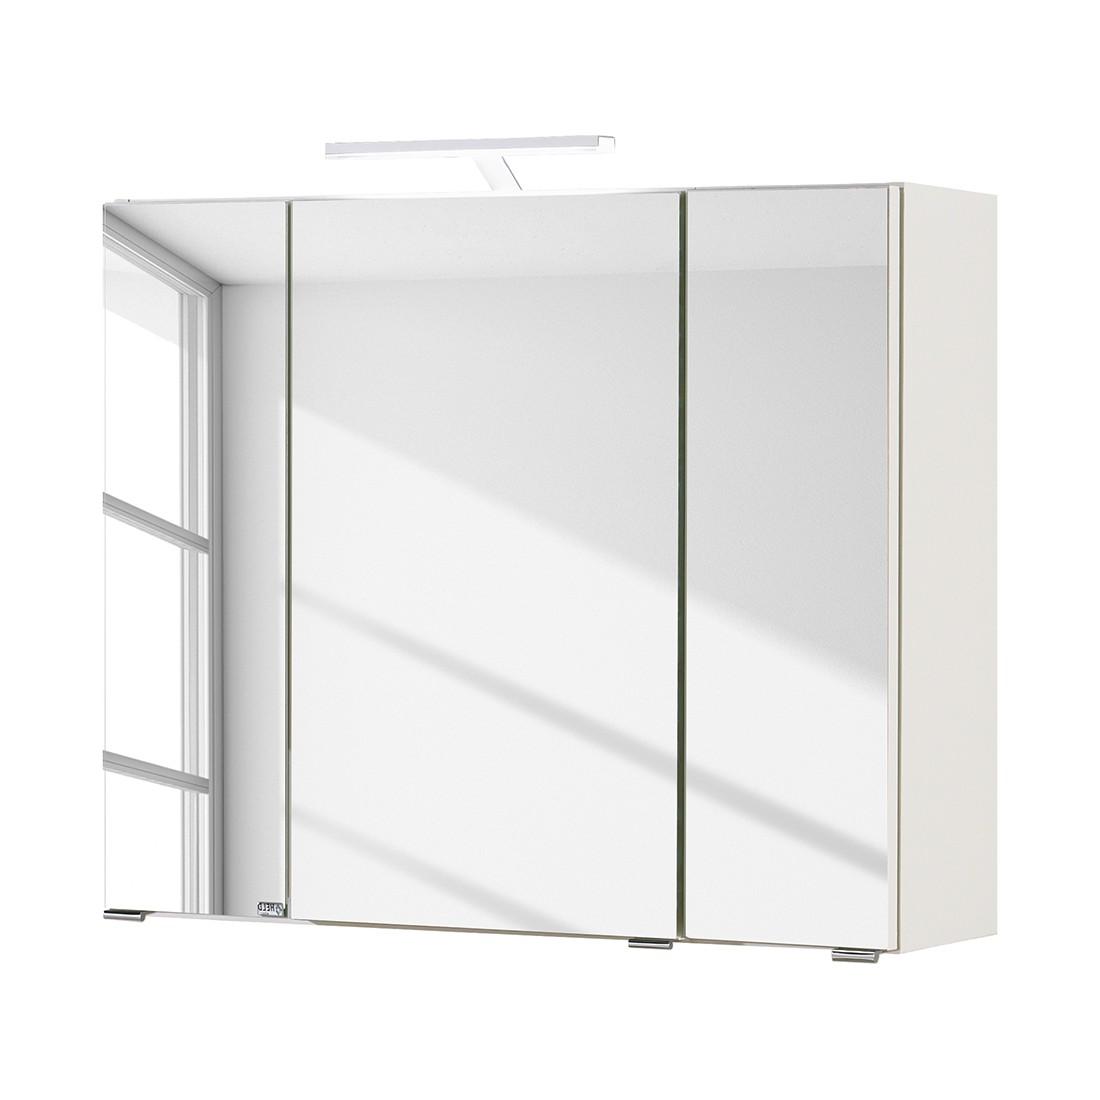 Armoire avec miroir Turda II - Avec éclairage Blanc, Giessbach